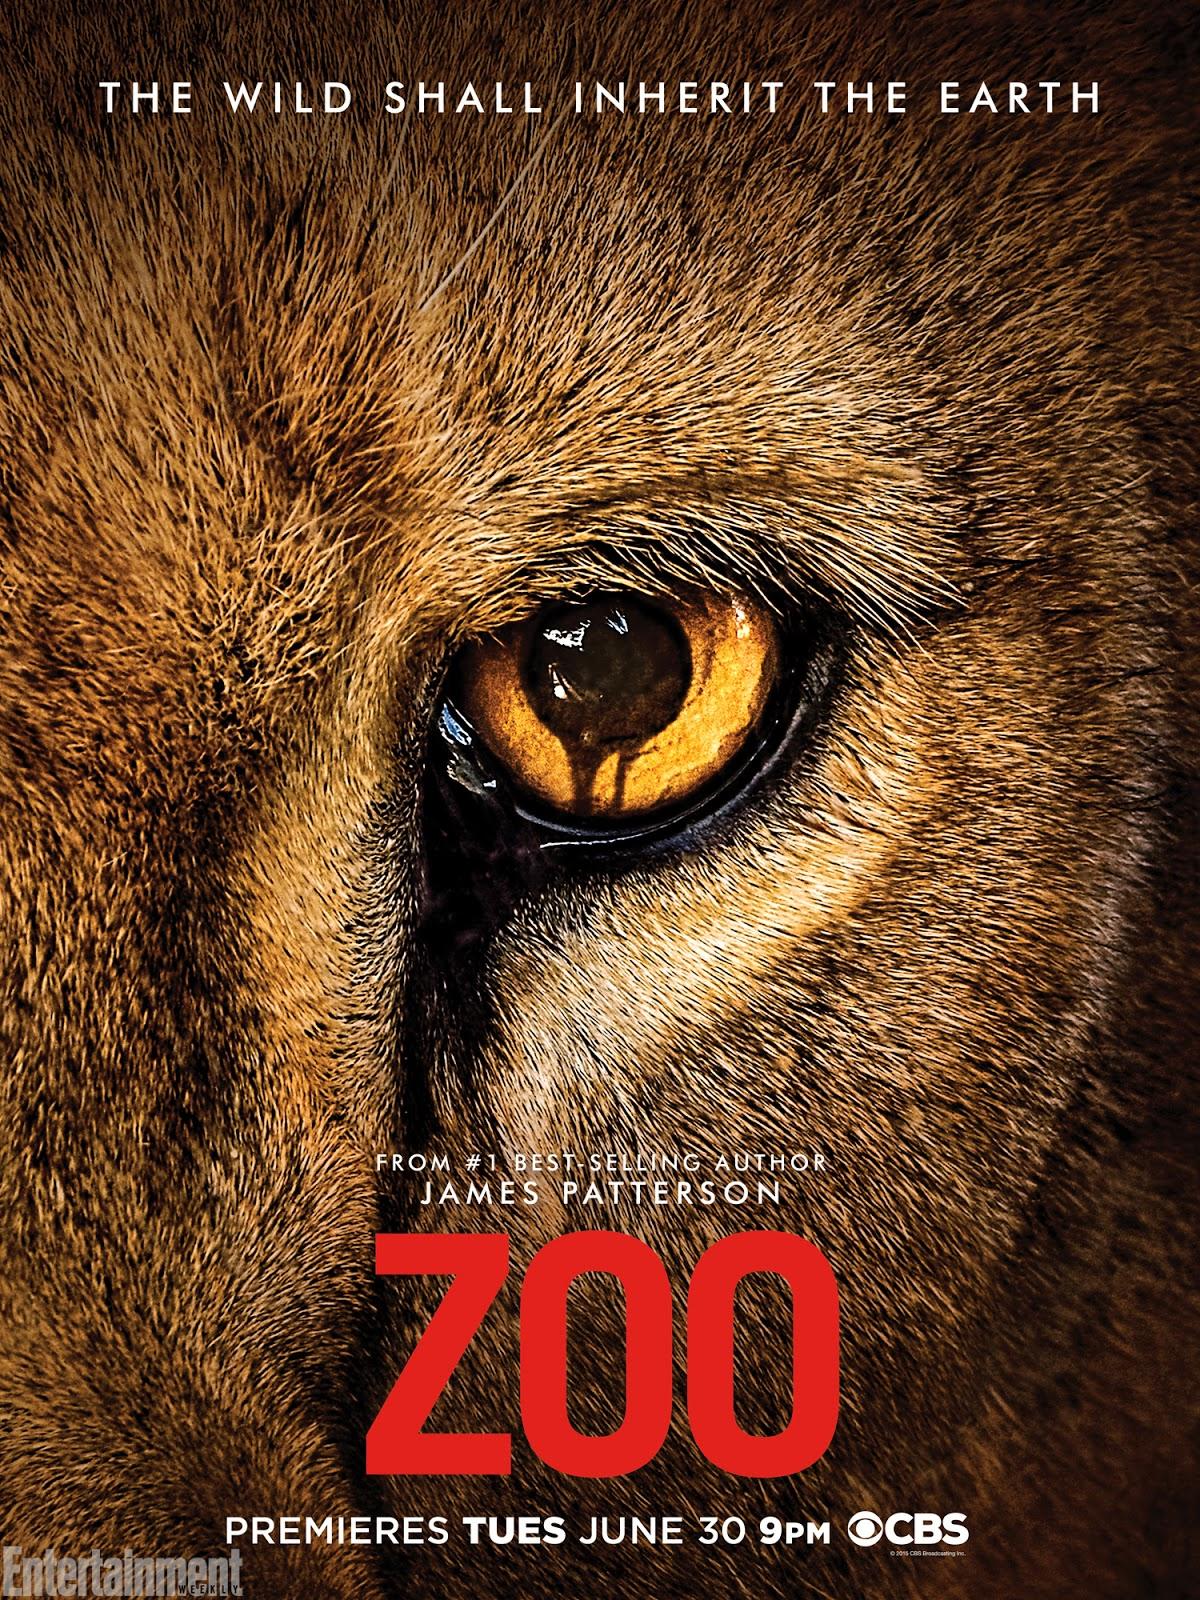 Zoo_TV_series_promo_poster.jpg